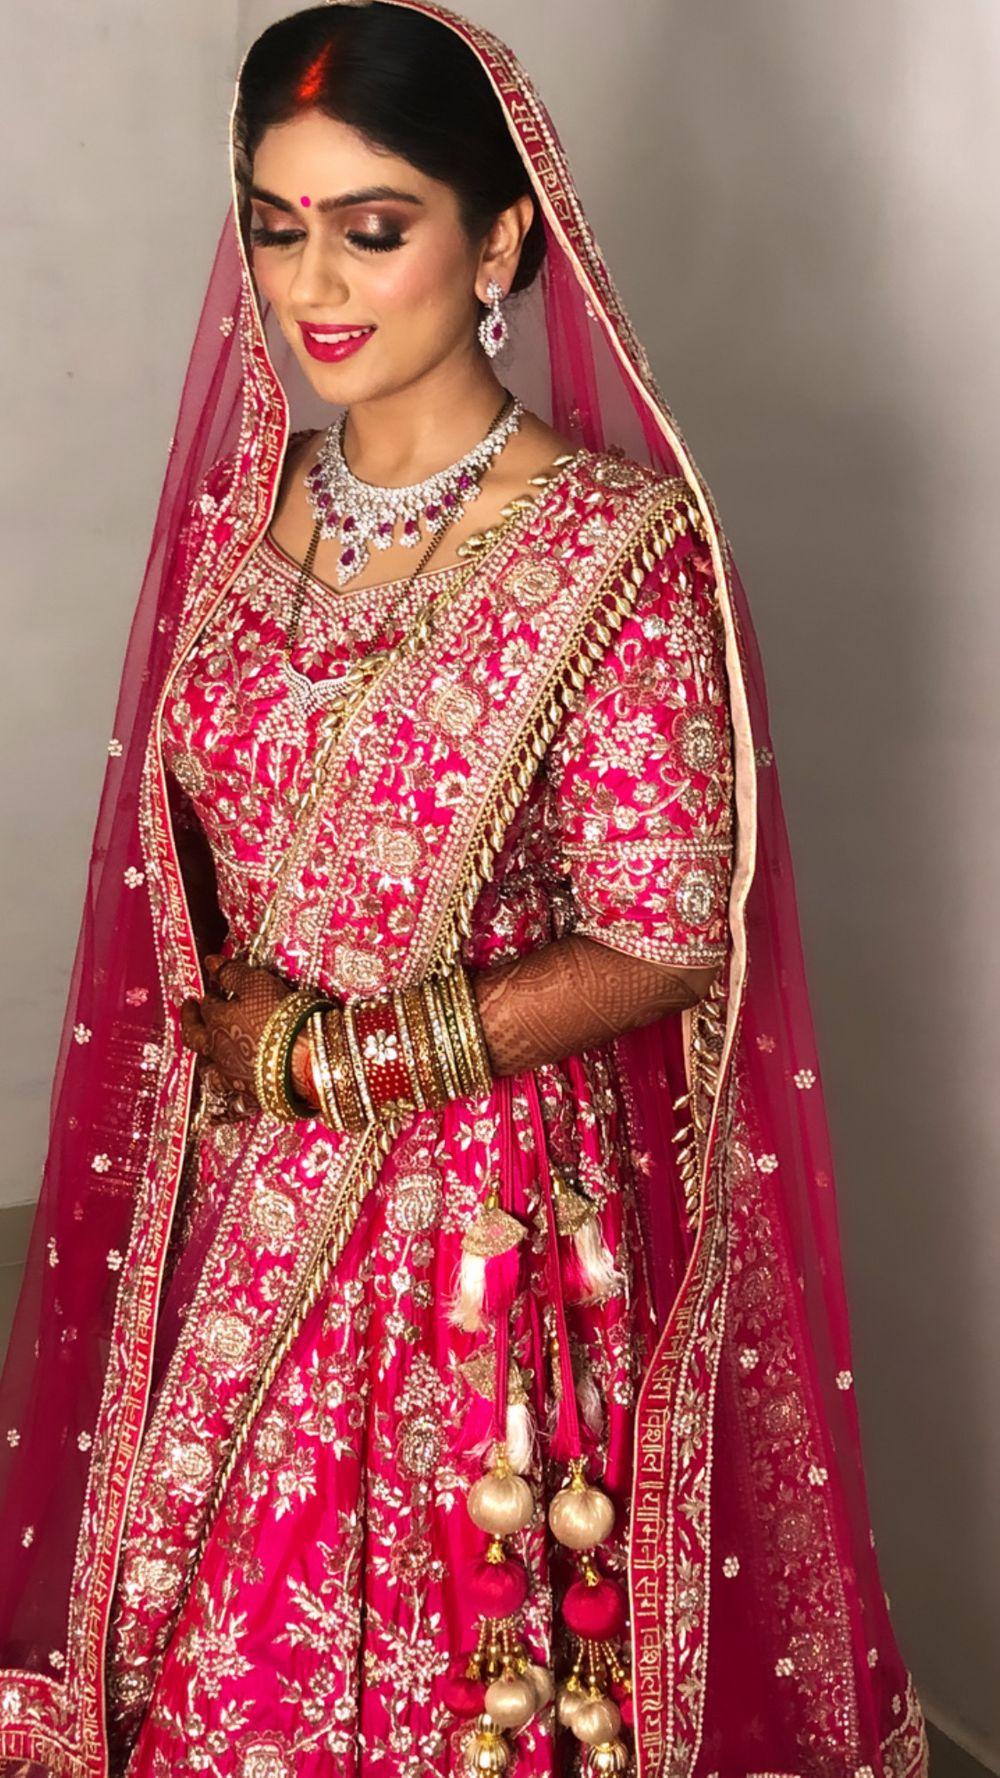 Photo From Yamini (Taj Lucknow) - By Makeovers By Kamakshi Soni